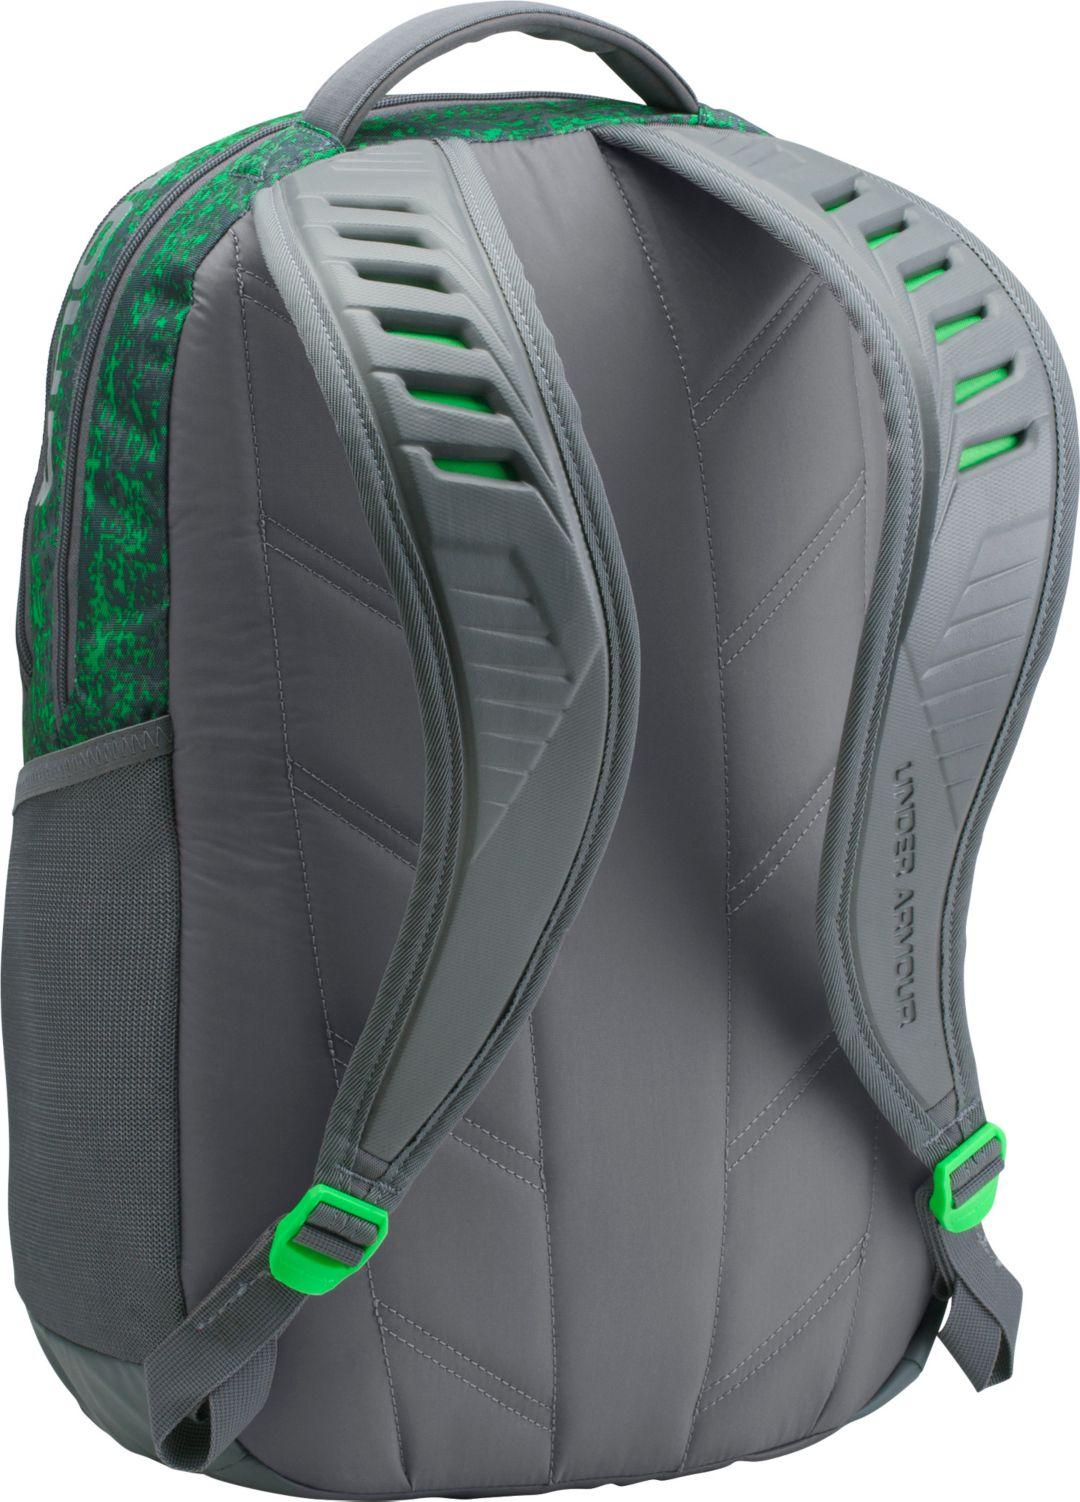 23e2704cad Cheapest Under Armour Backpacks   The Shred Centre